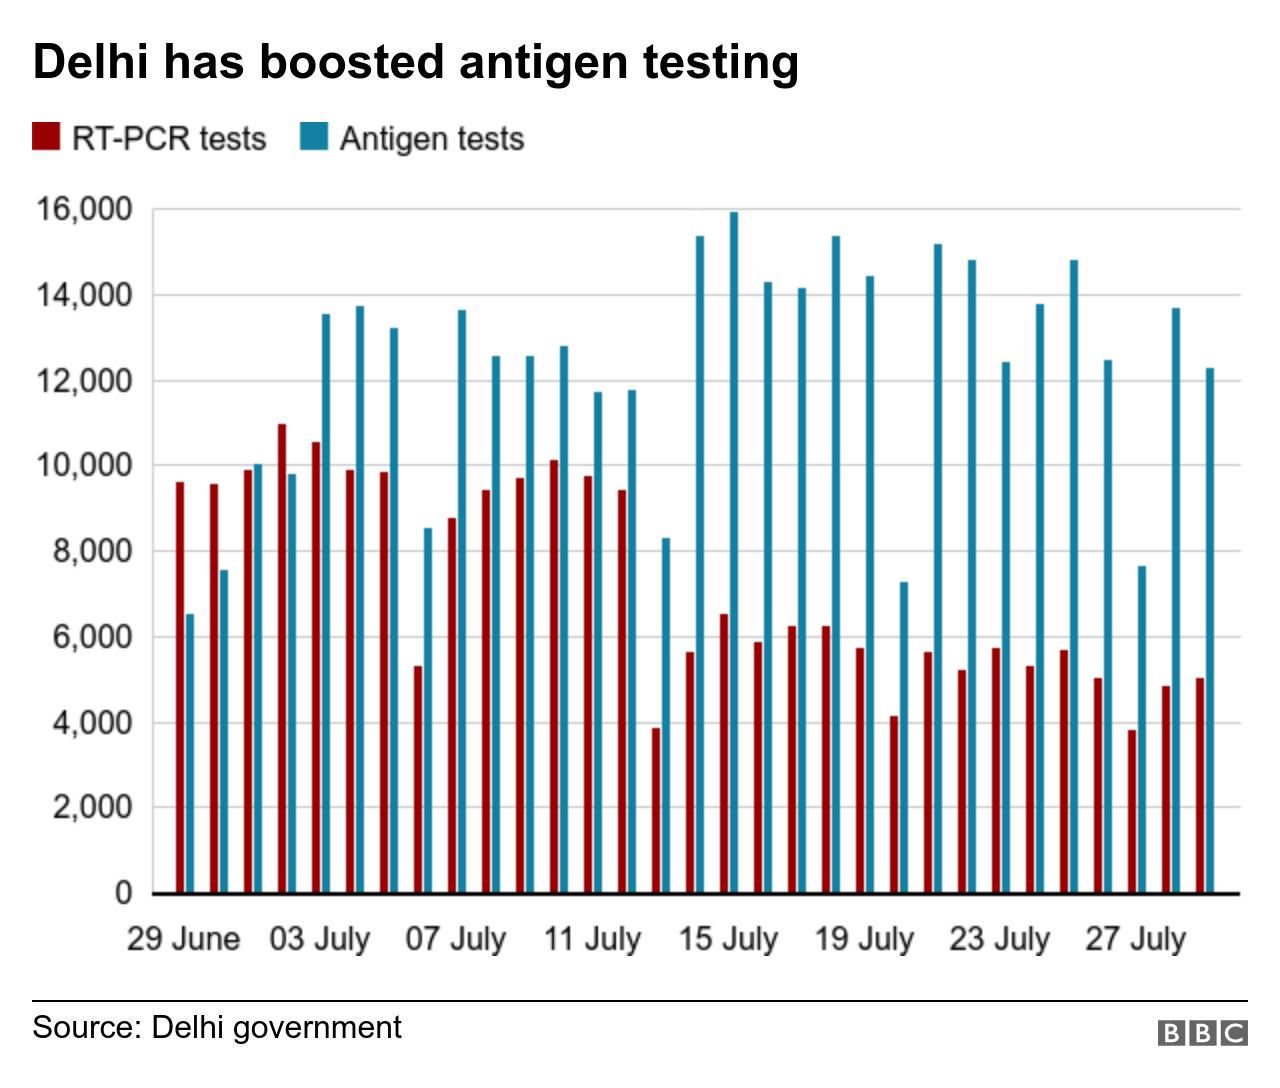 Bar chart showing antigen and PCR tests in Delhi